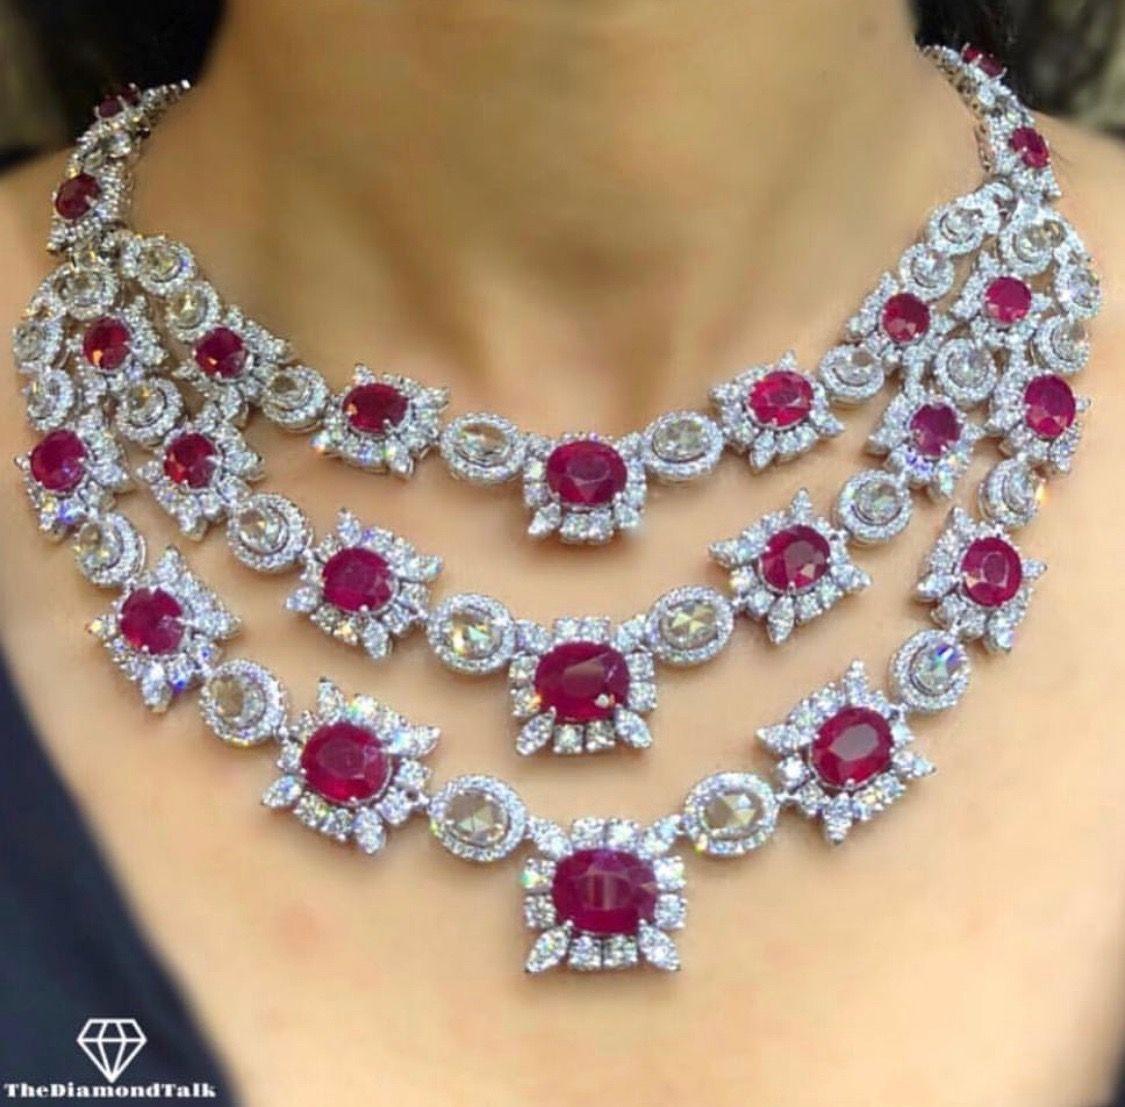 44+ Wedding beautiful diamond necklace ideas in 2021